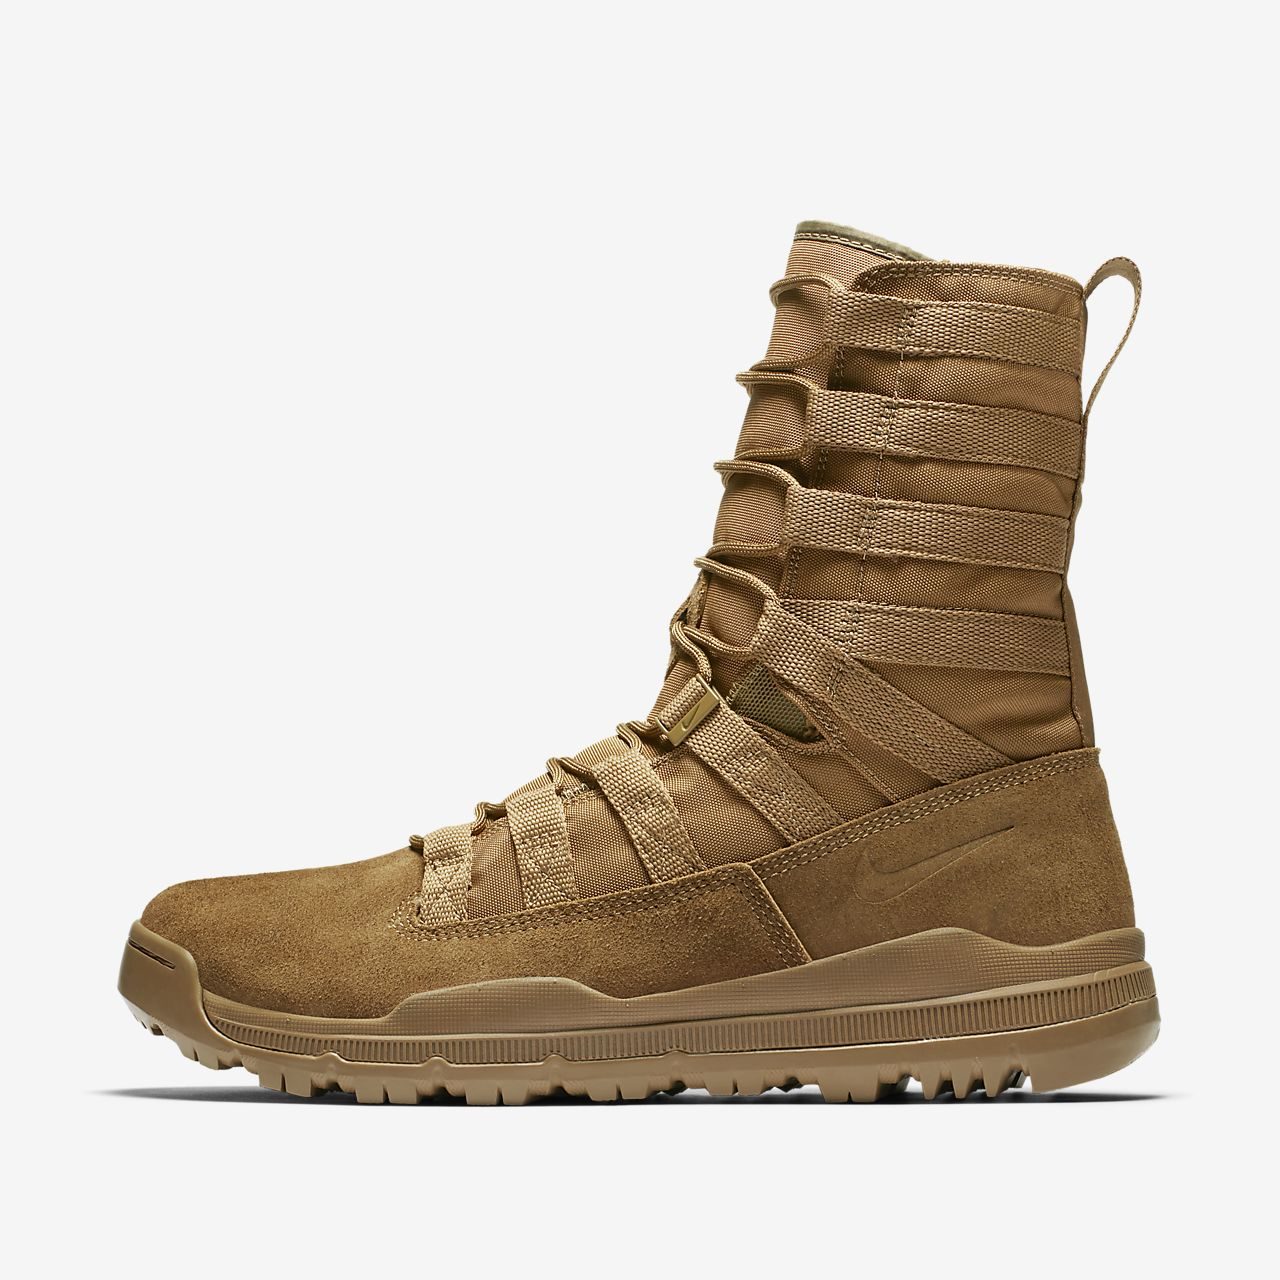 "Nike SFB GEN 2 LT 8"" Outdoor Training Boot"